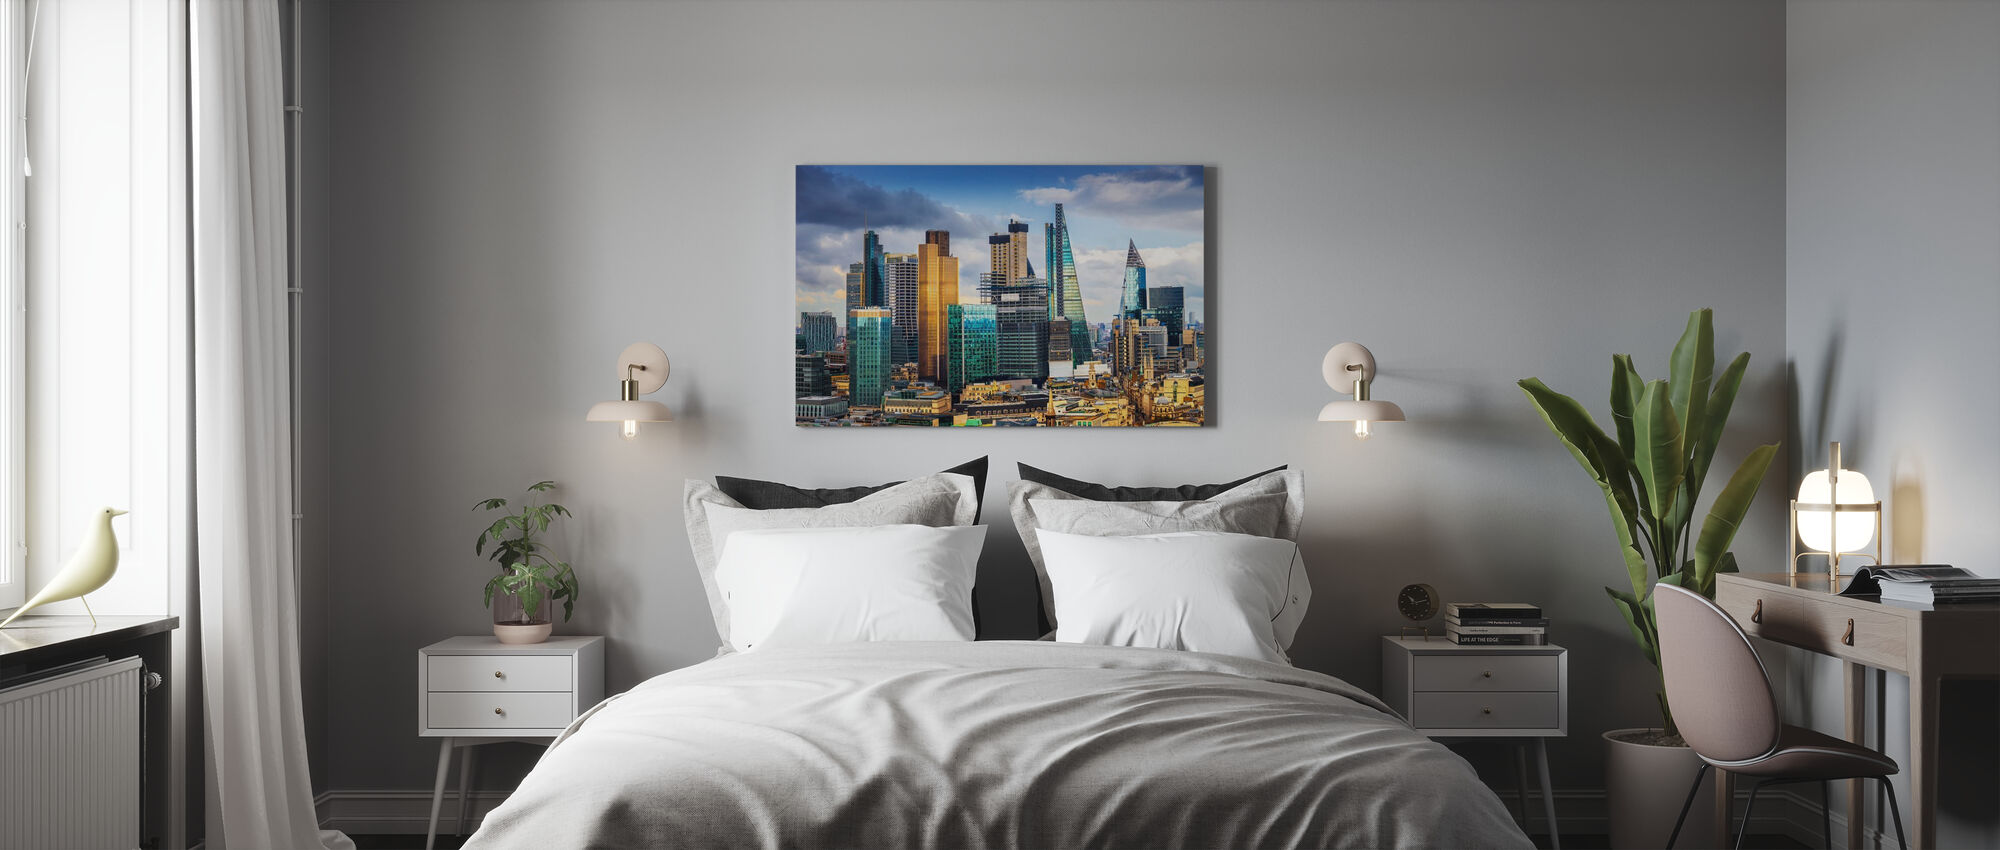 London Skyline - Canvas print - Bedroom